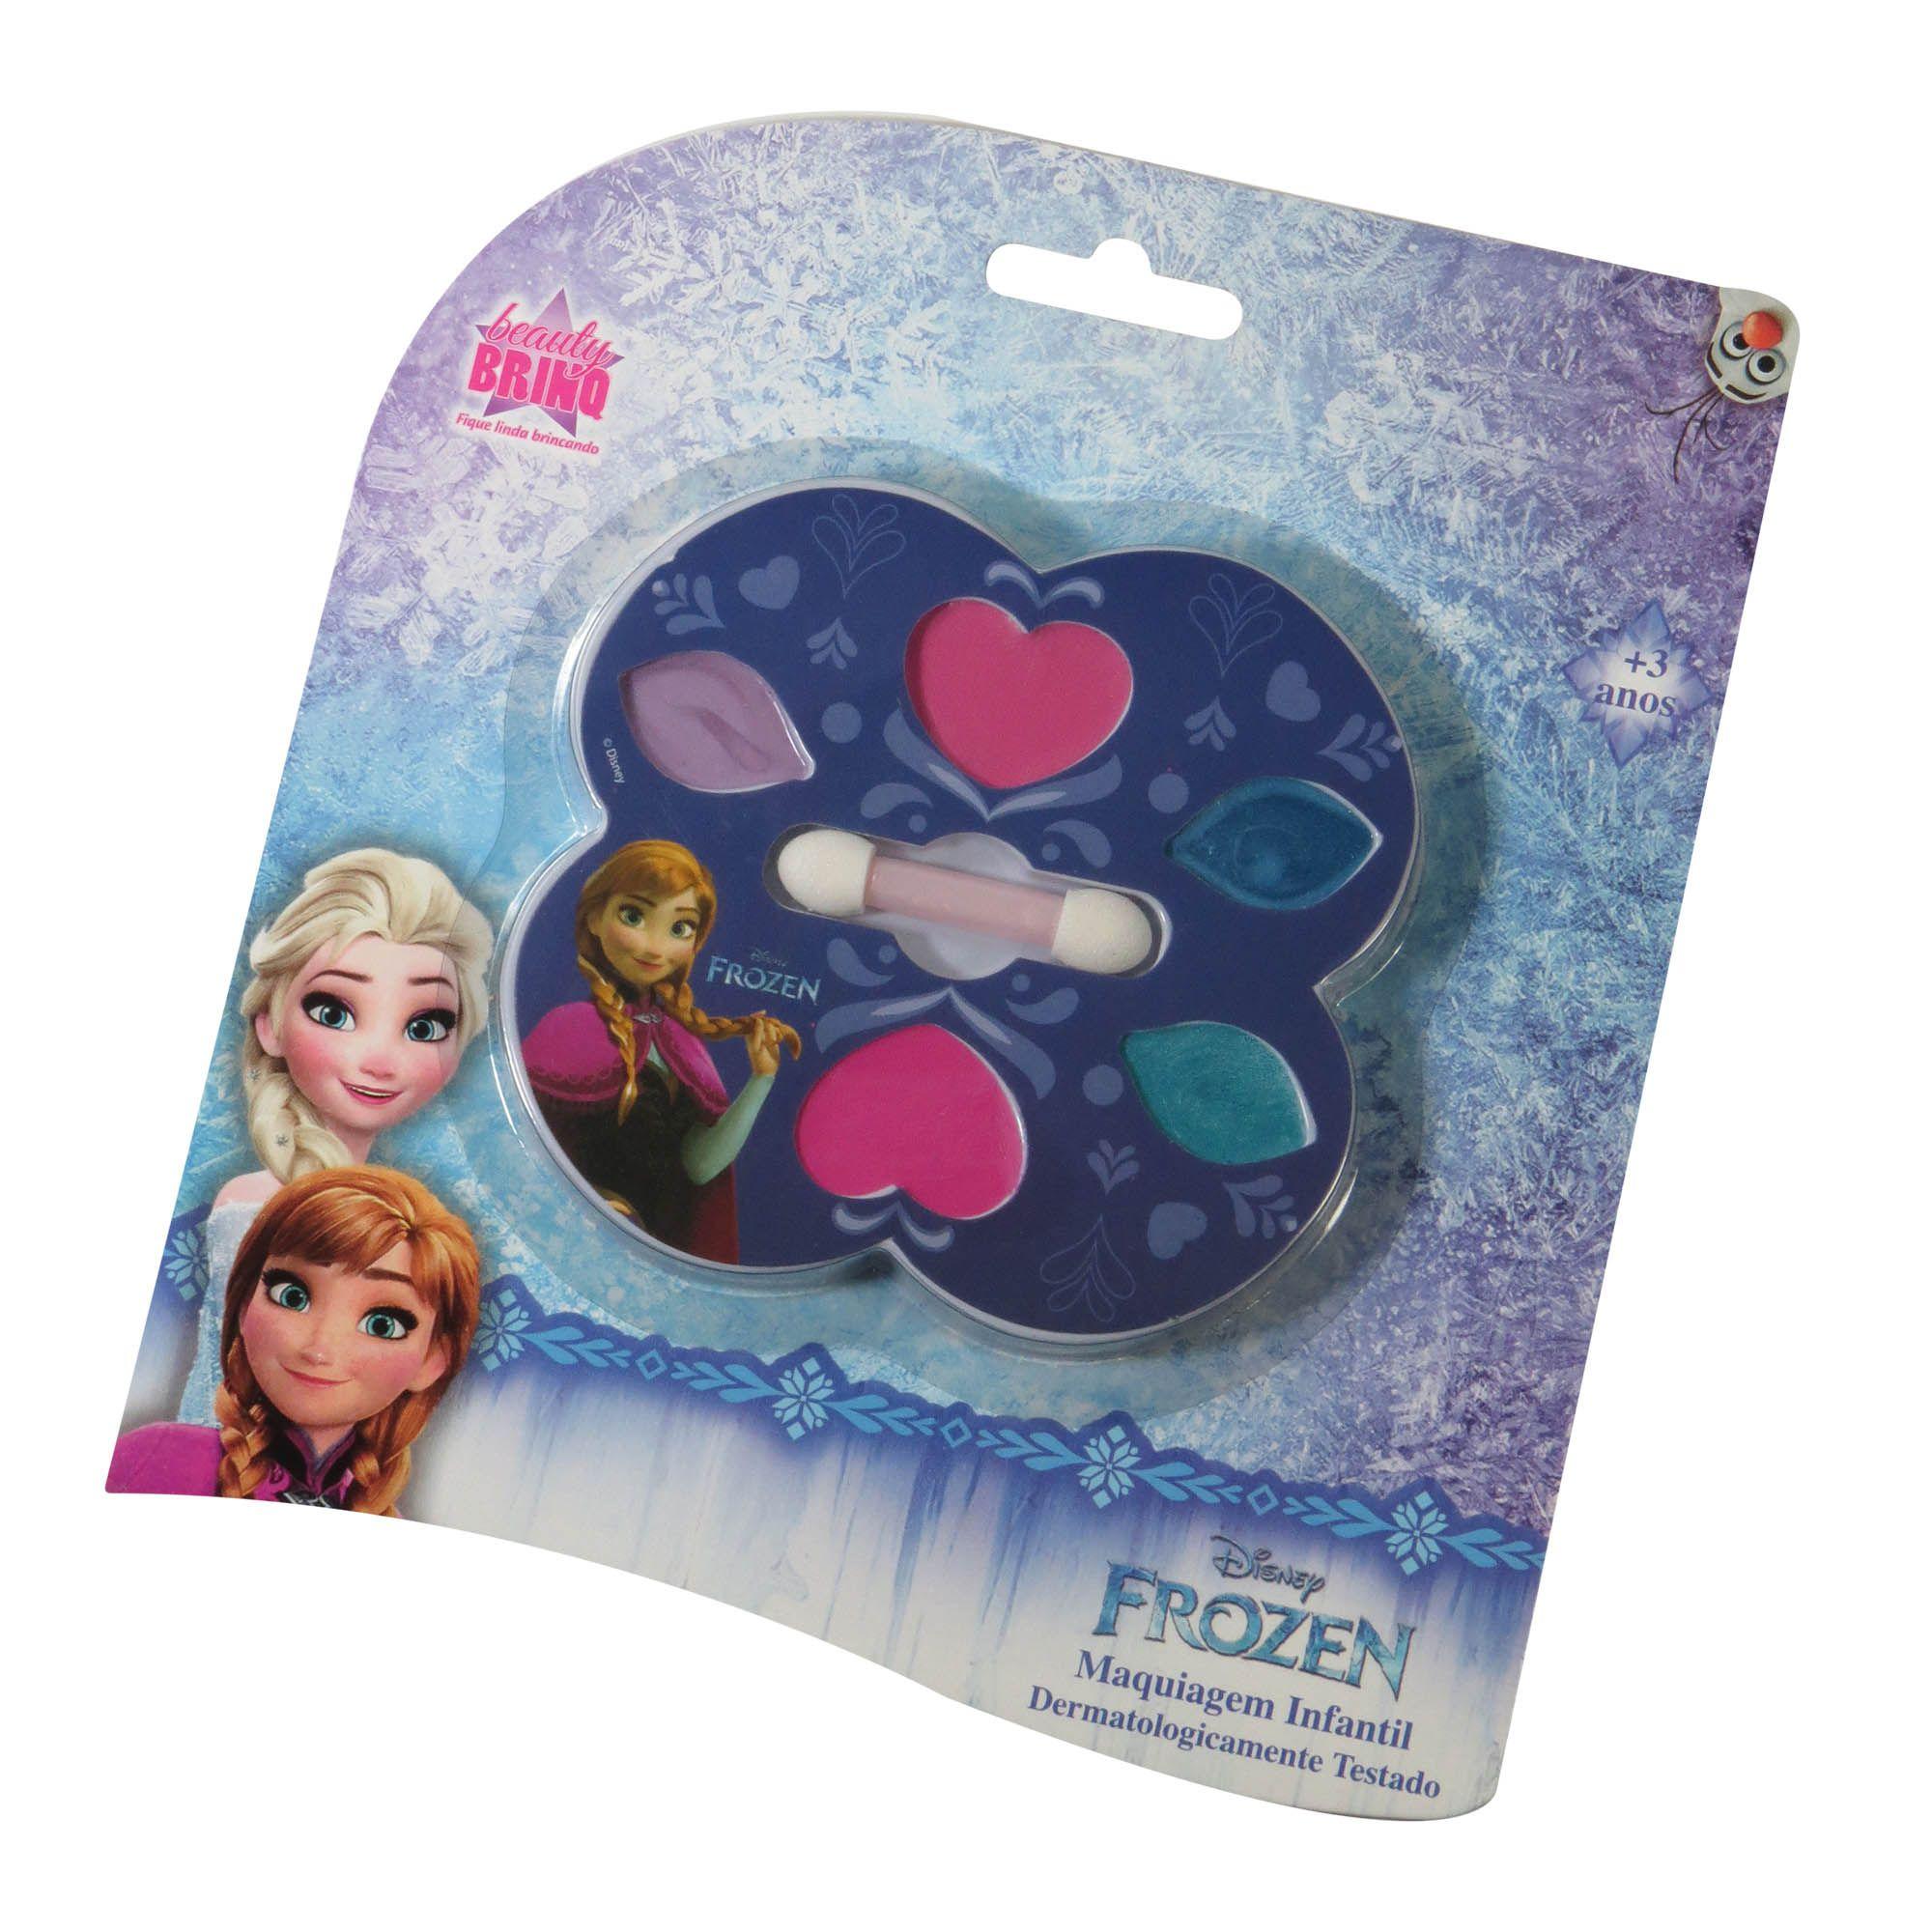 Estojo Frozen Anna Batom Sombra Blush Maquiagem Infantil